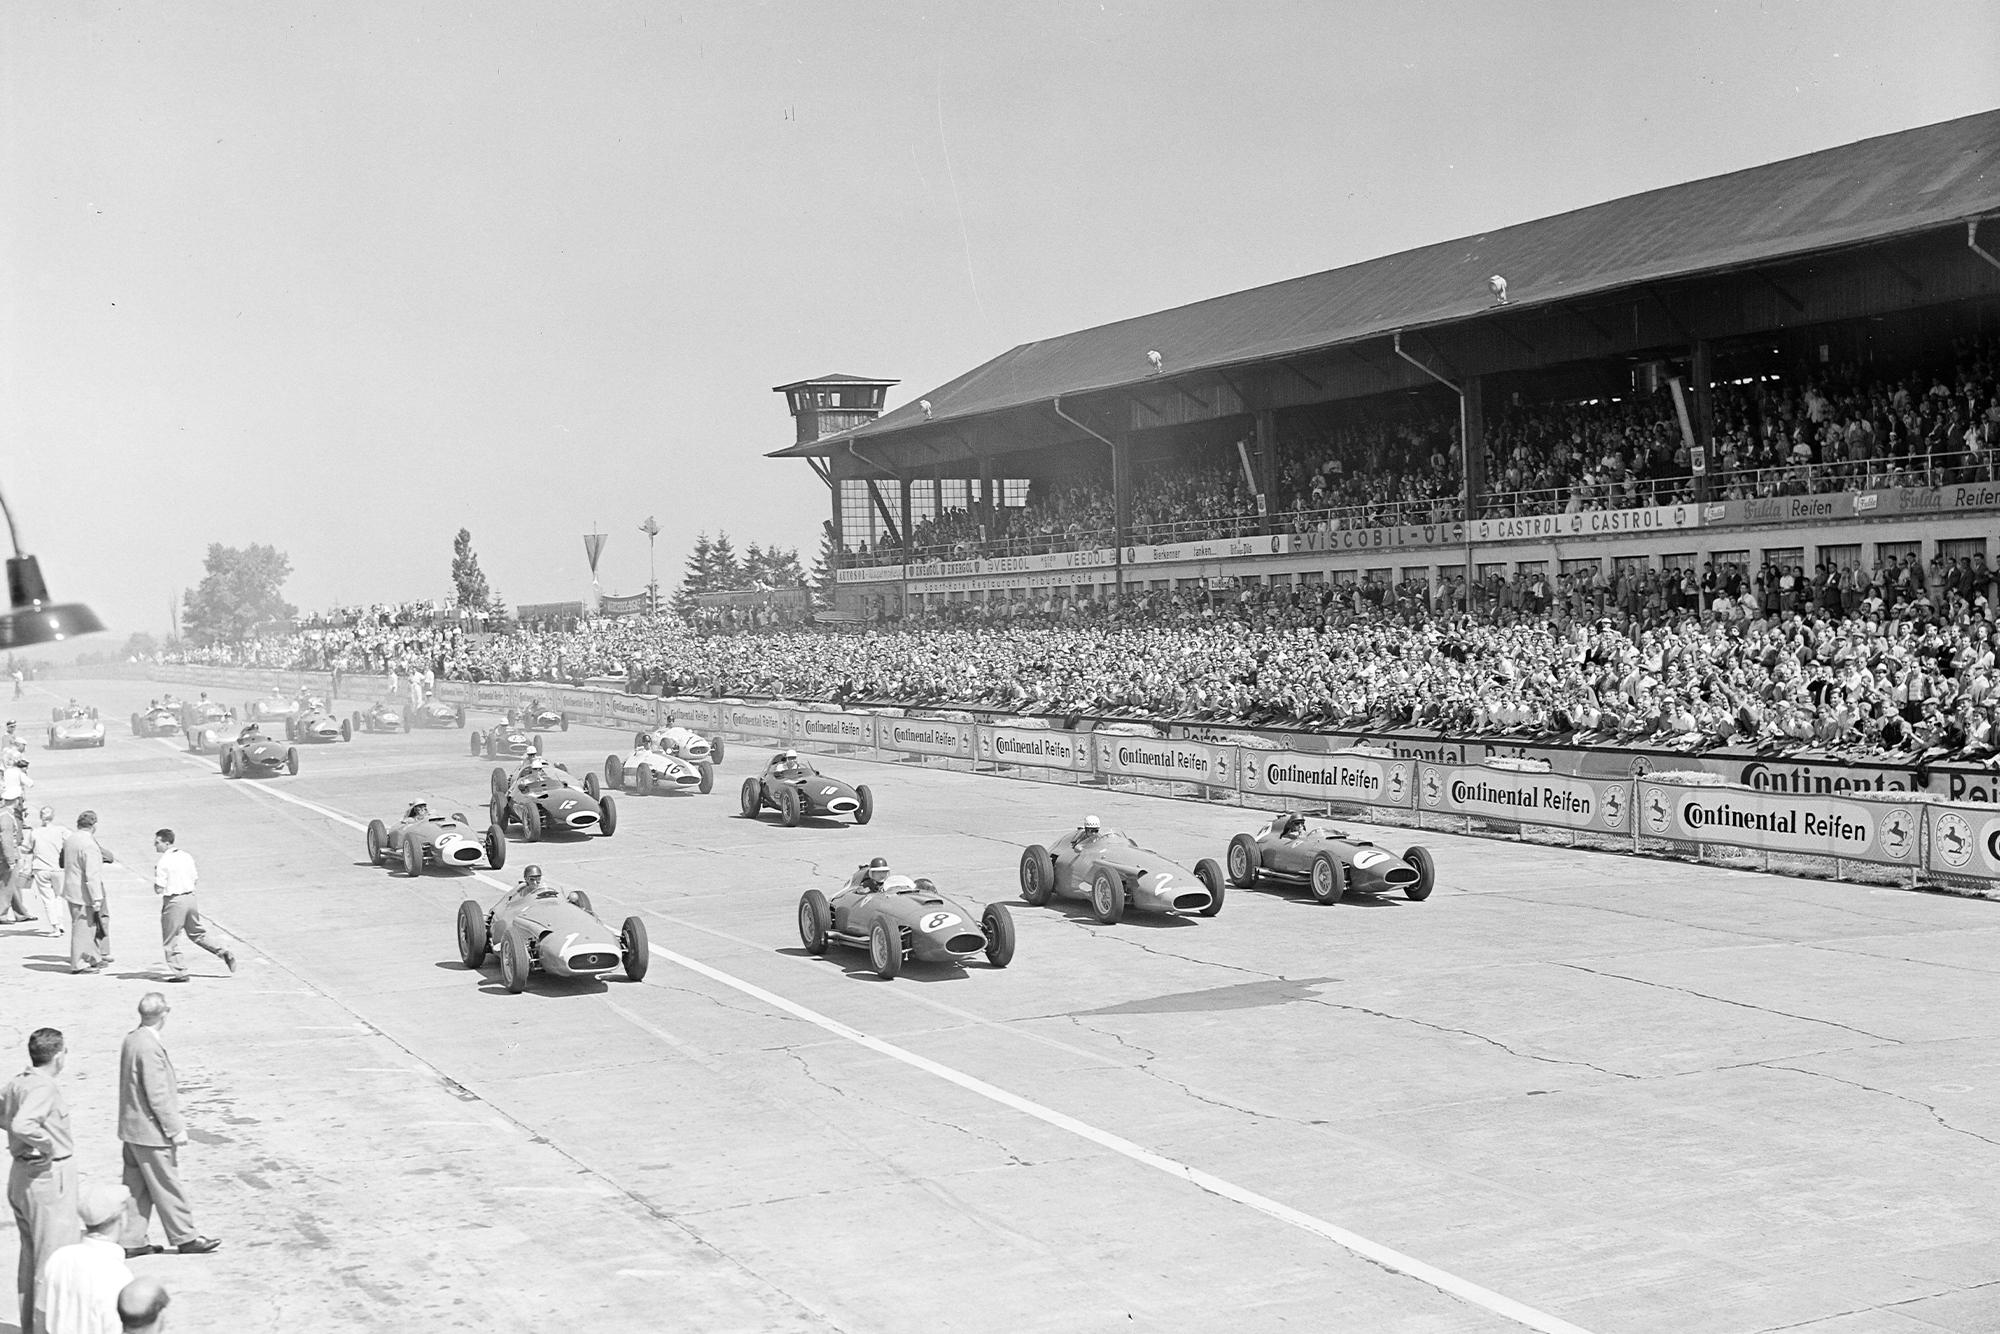 Juan Manuel Fangio, Maserati 250F, alongside Mike Hawthorn, Ferrari D50 (#8), Jean Behra, Maserati 250F (#2), and Peter Collins, Ferrari D50 (#7), at the start of the 1957 German Grand Prix, Nurburgring.